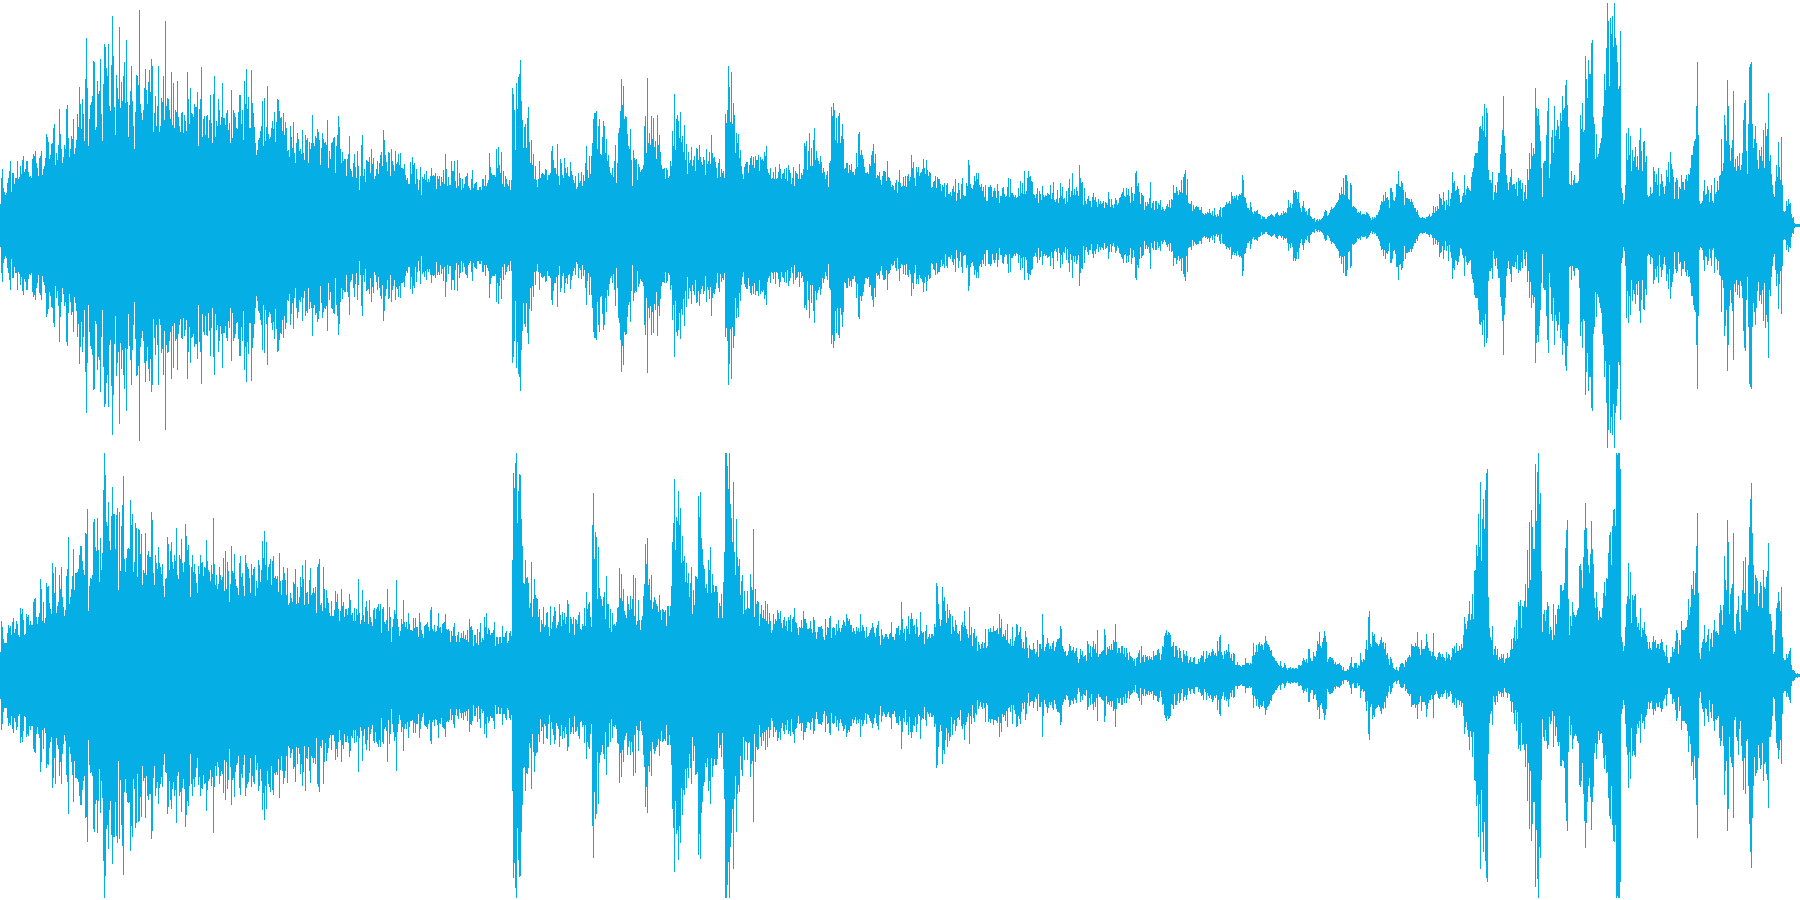 FMラジオ的ジングル4の再生済みの波形